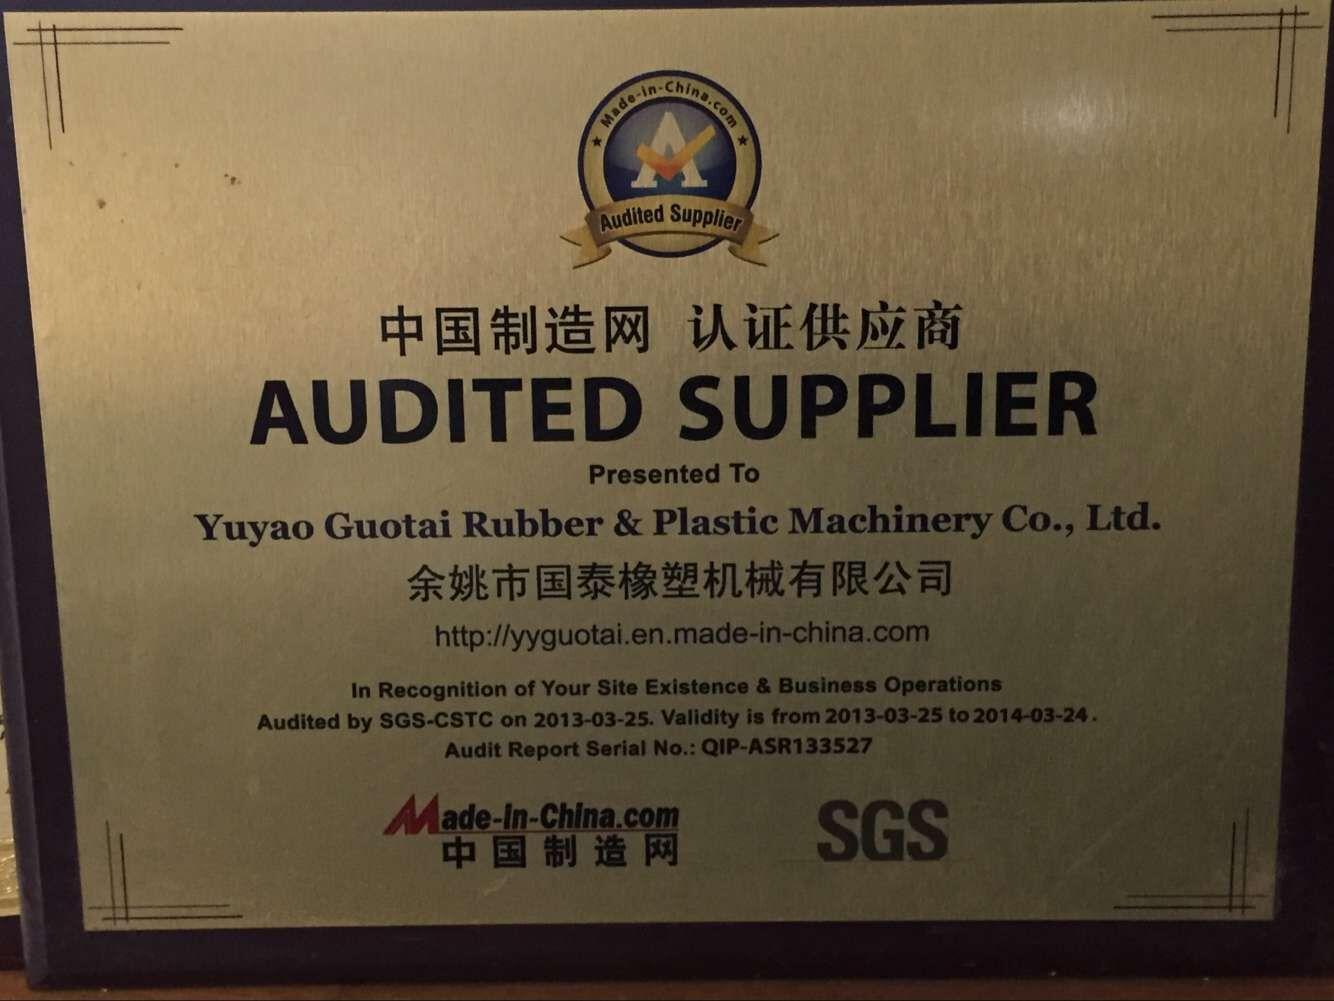 Yuyao Guotai Machinery Co., Ltd. related certificate